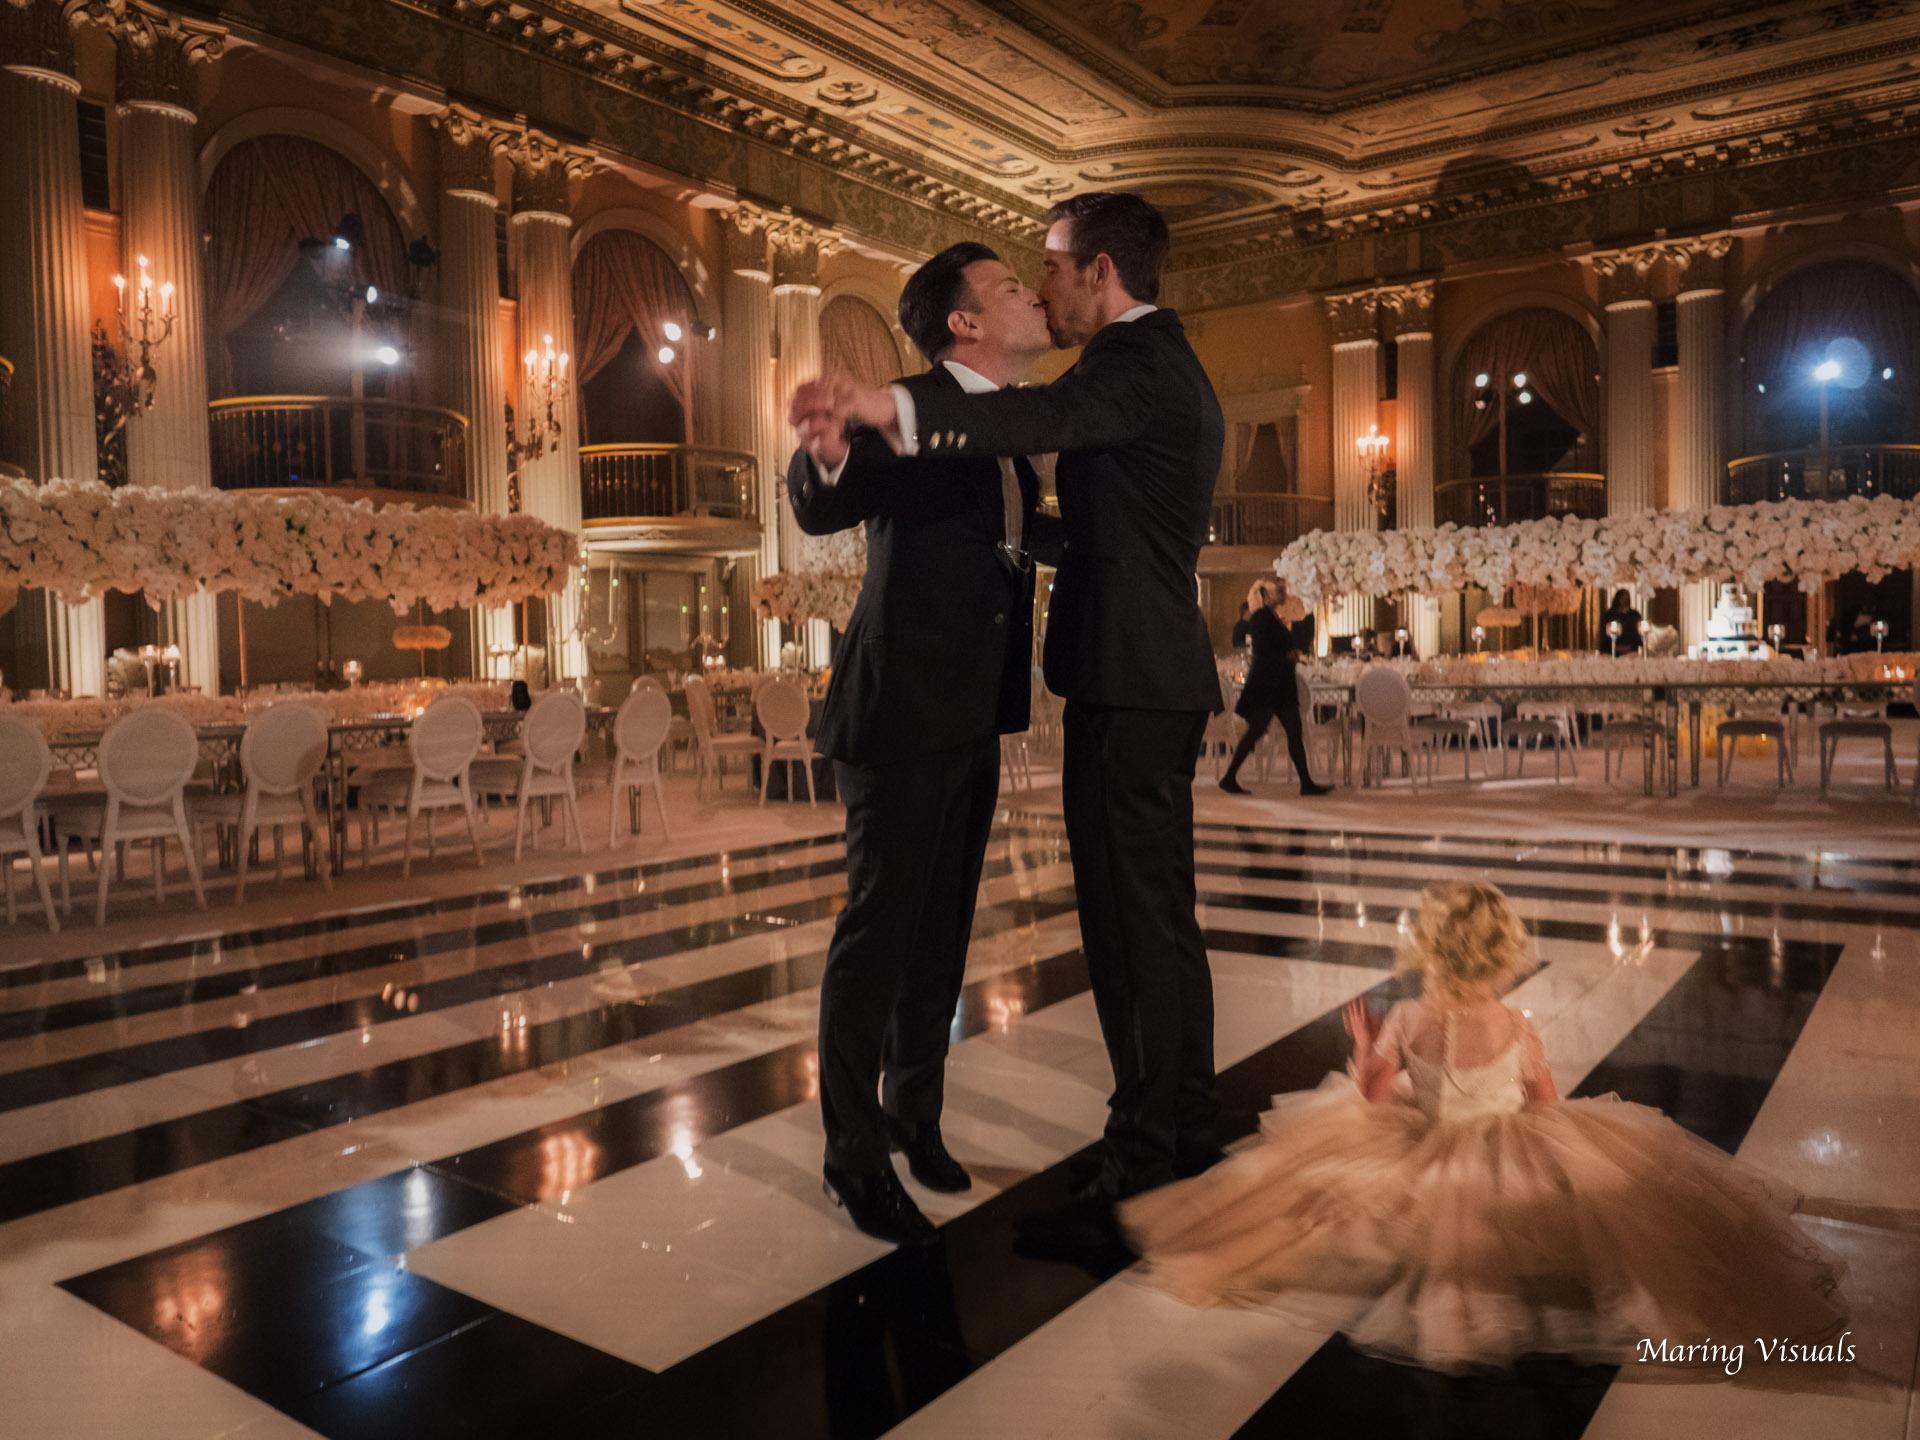 David Tutera Weddings by Maring Visuals 00538.jpg